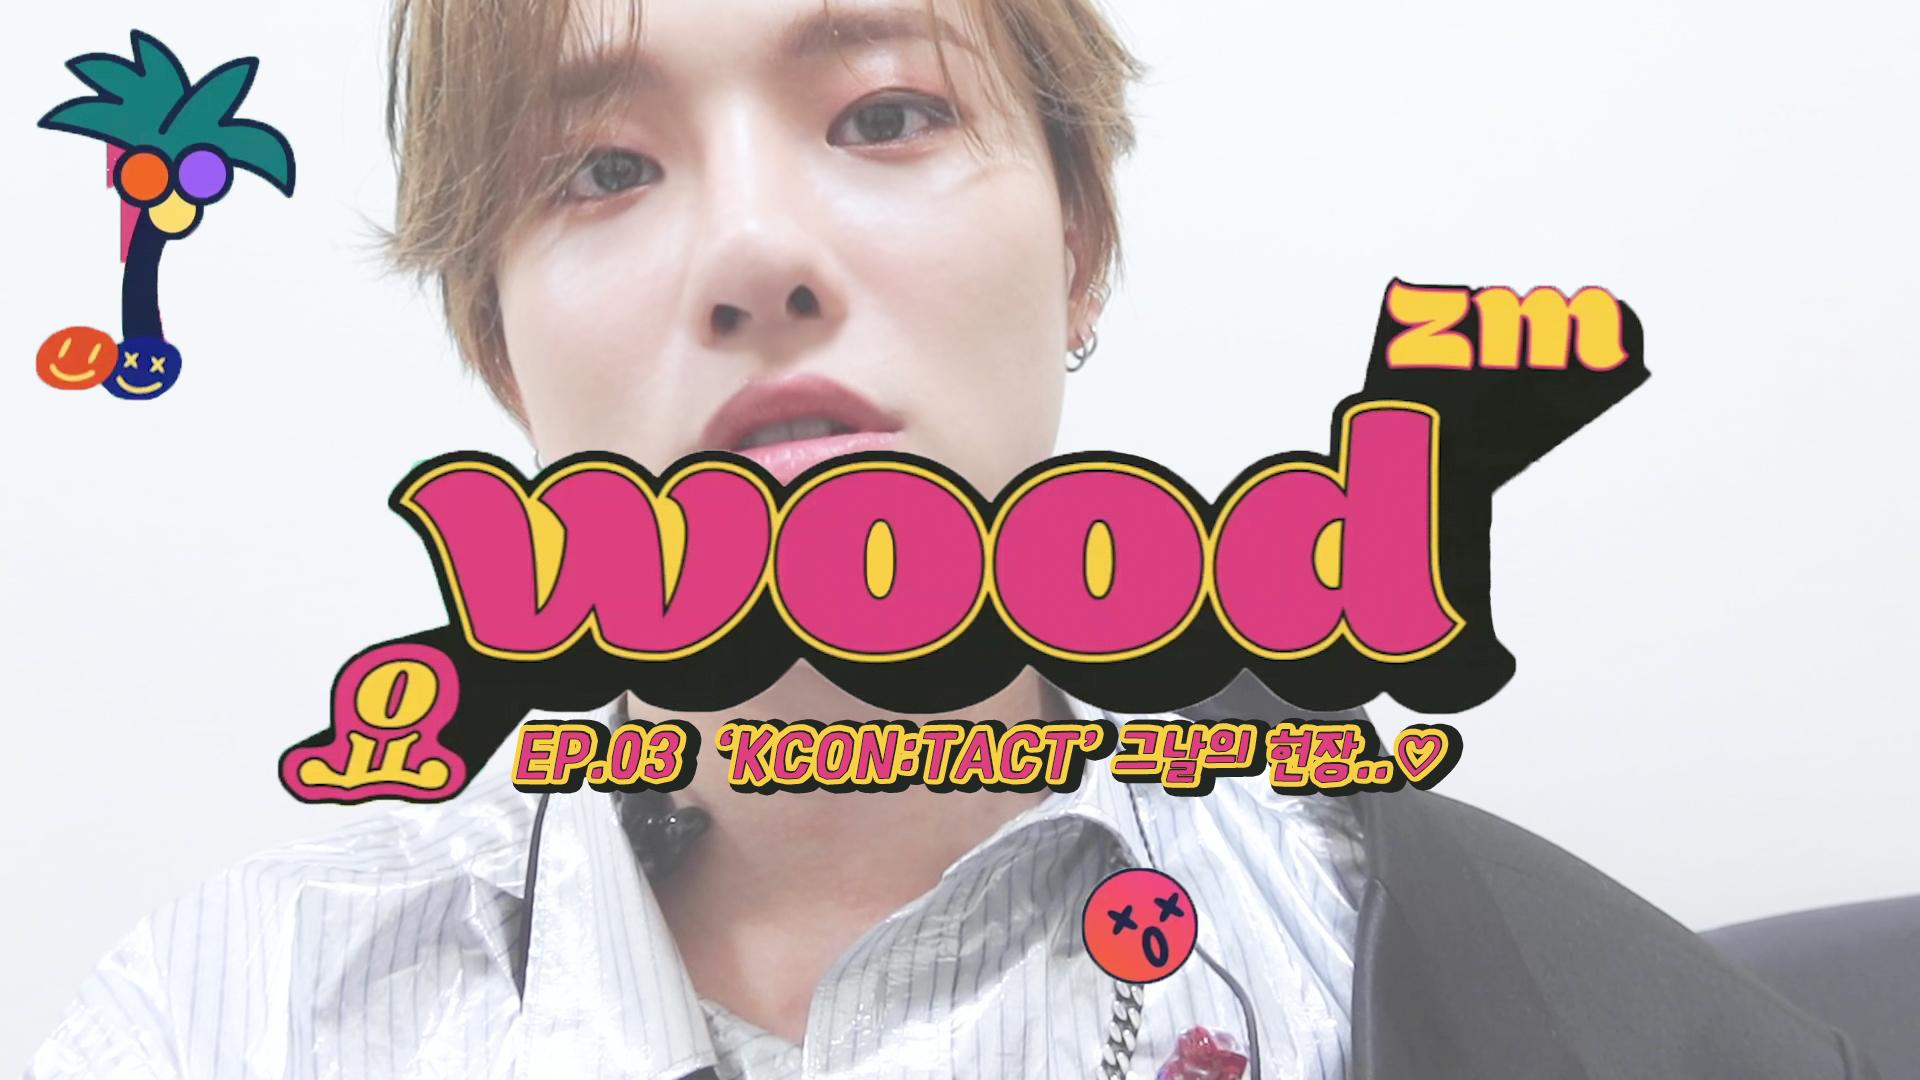 WOODZ - 요WOODZM (YOWOODZM) S2. EP.03